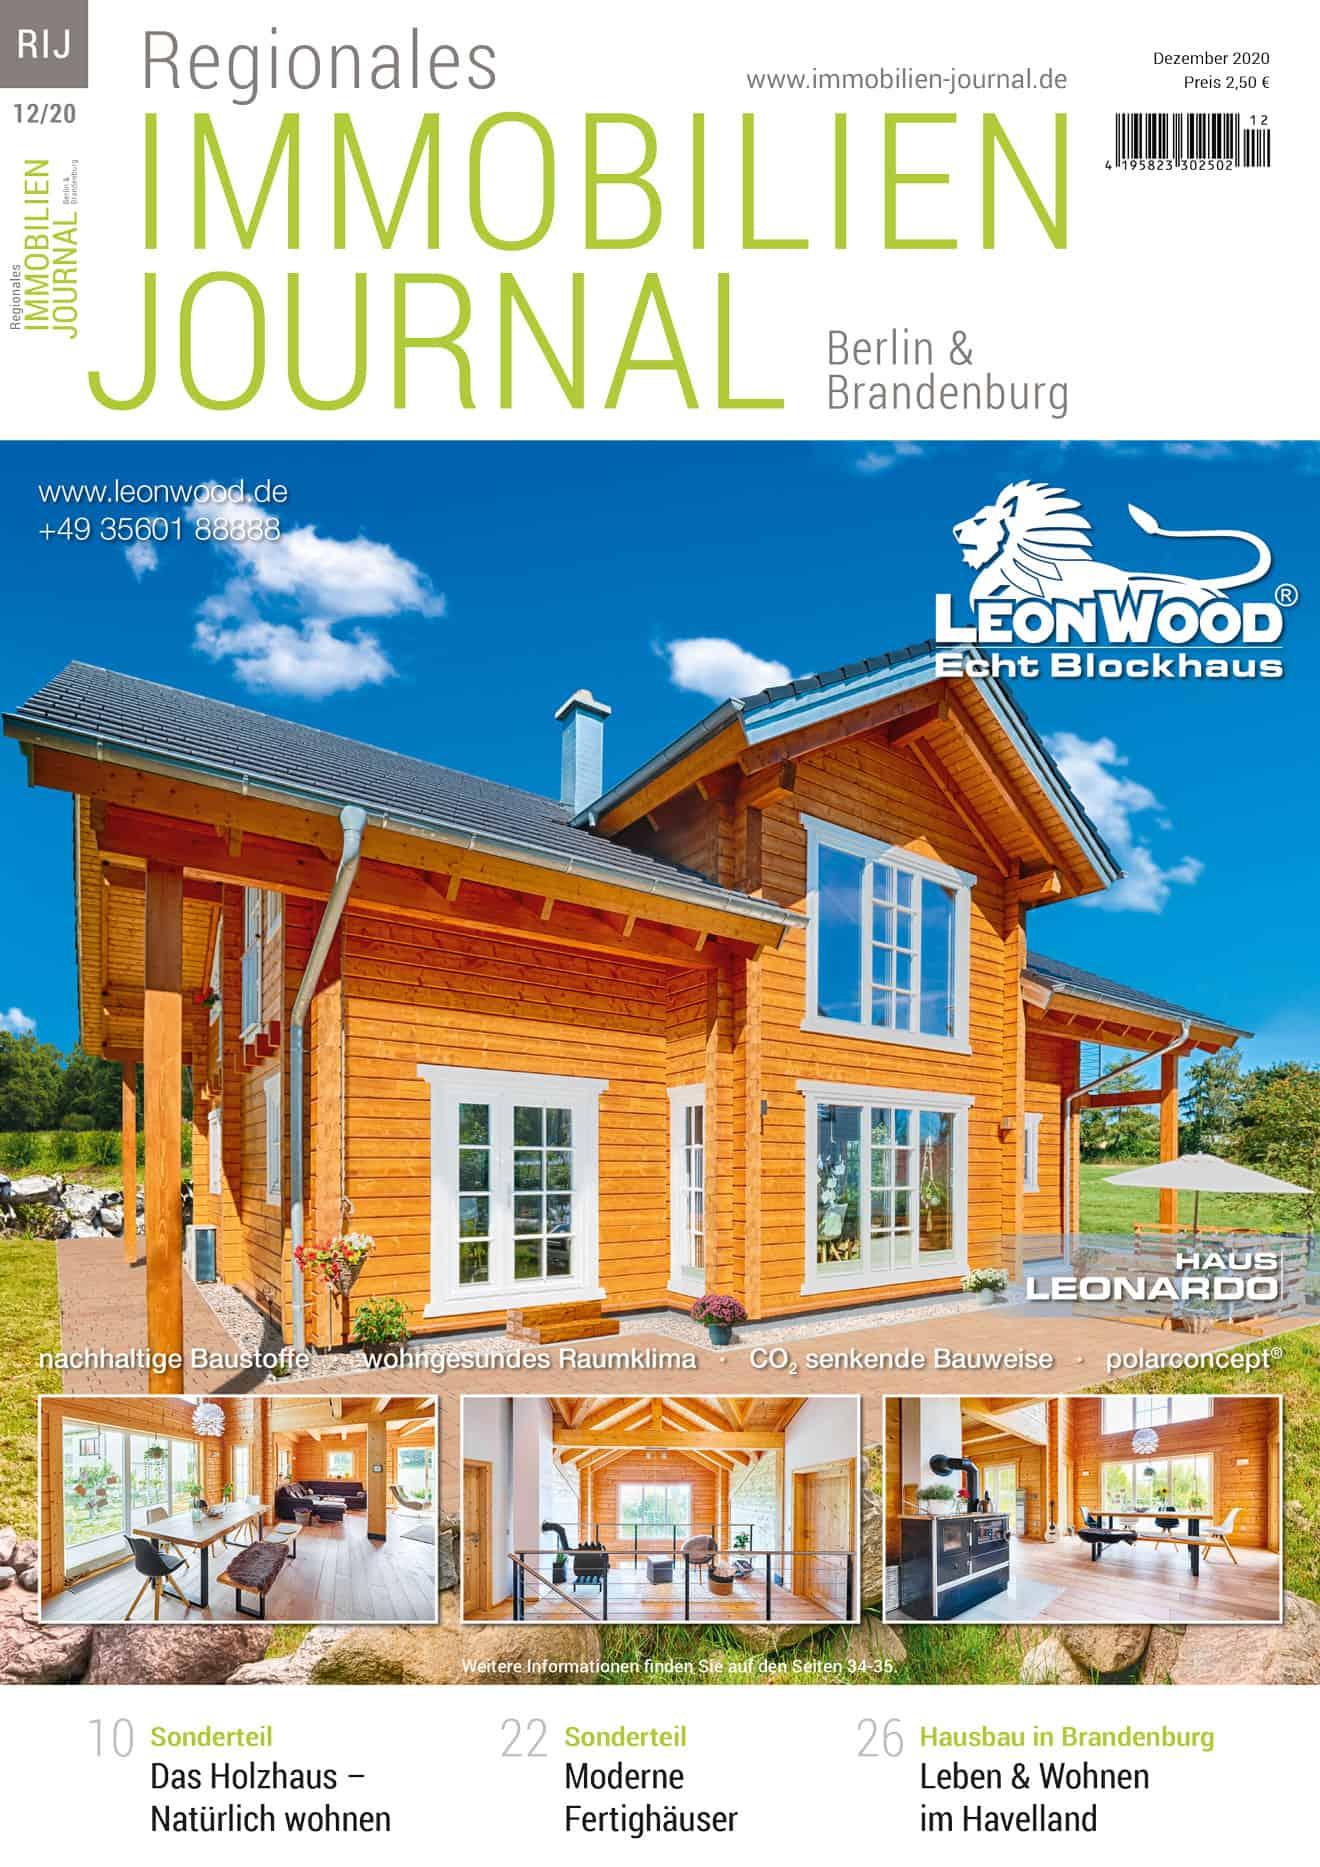 Regionales Immobilien Journal Berlin & Brandenburg 12-2020